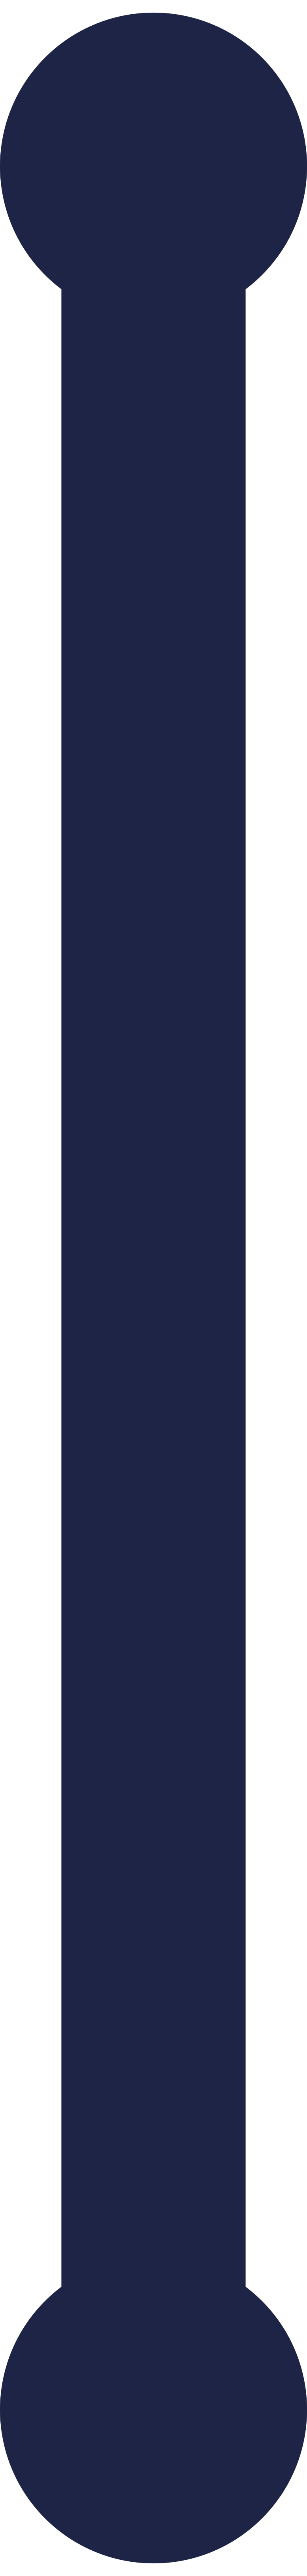 door handle 1 line Clipart illustration in PNG, SVG